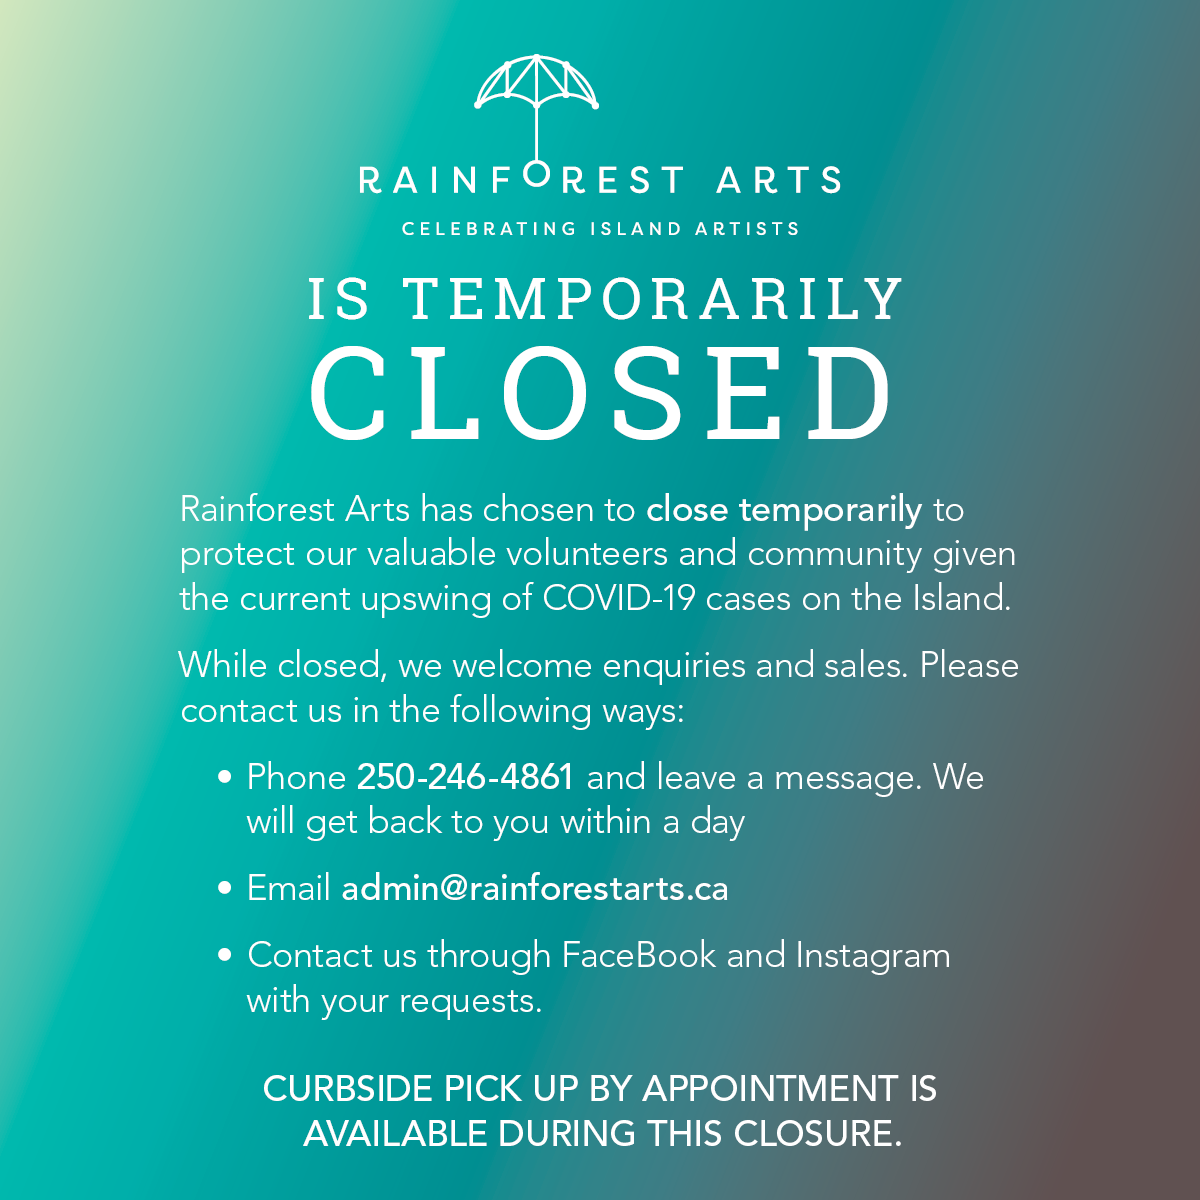 Rainforest Arts temporary closure due to COVID-19